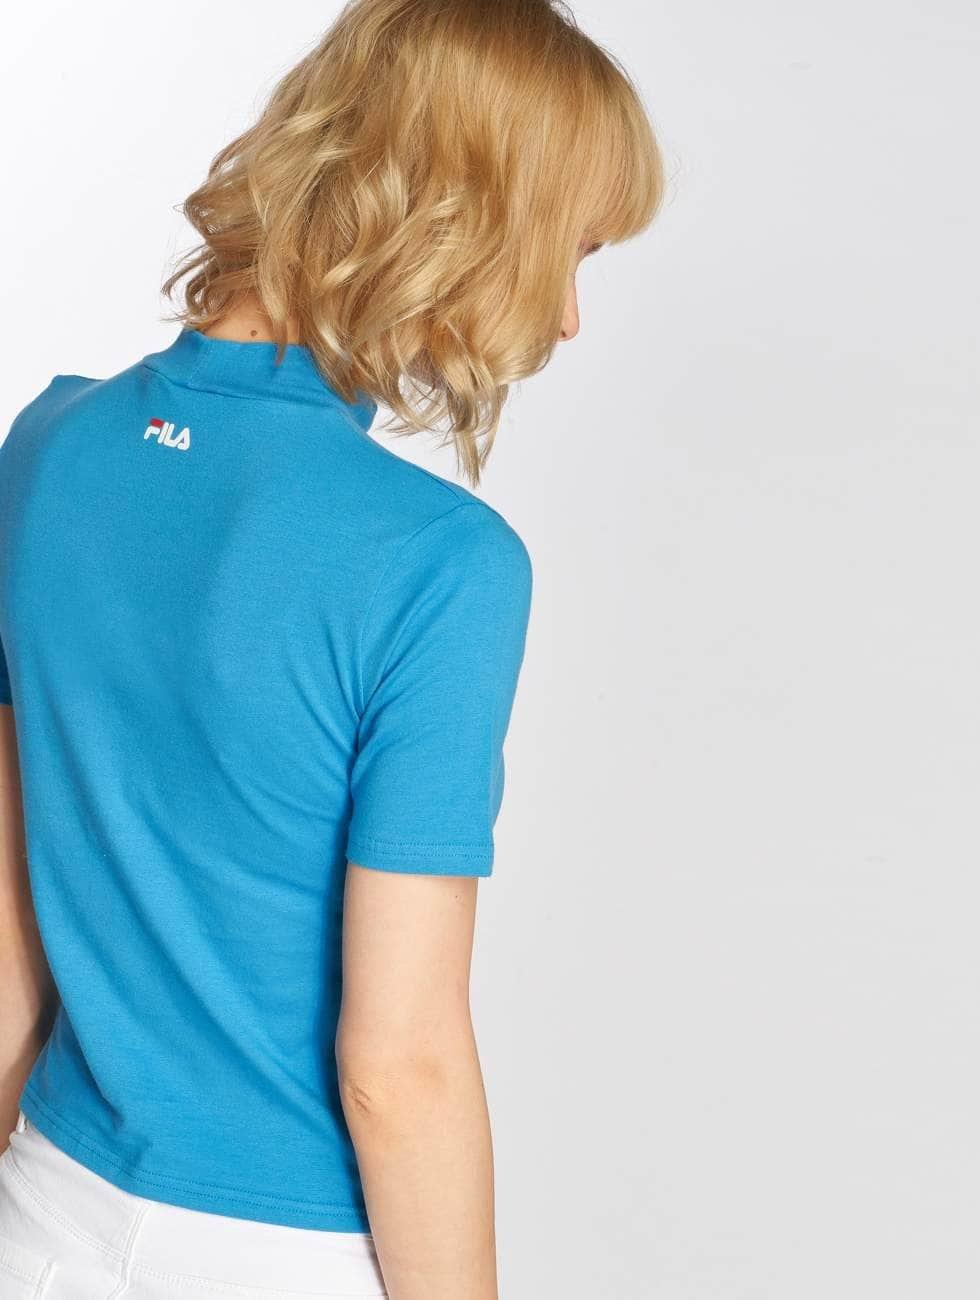 FILA T-Shirt Every Turtle bleu